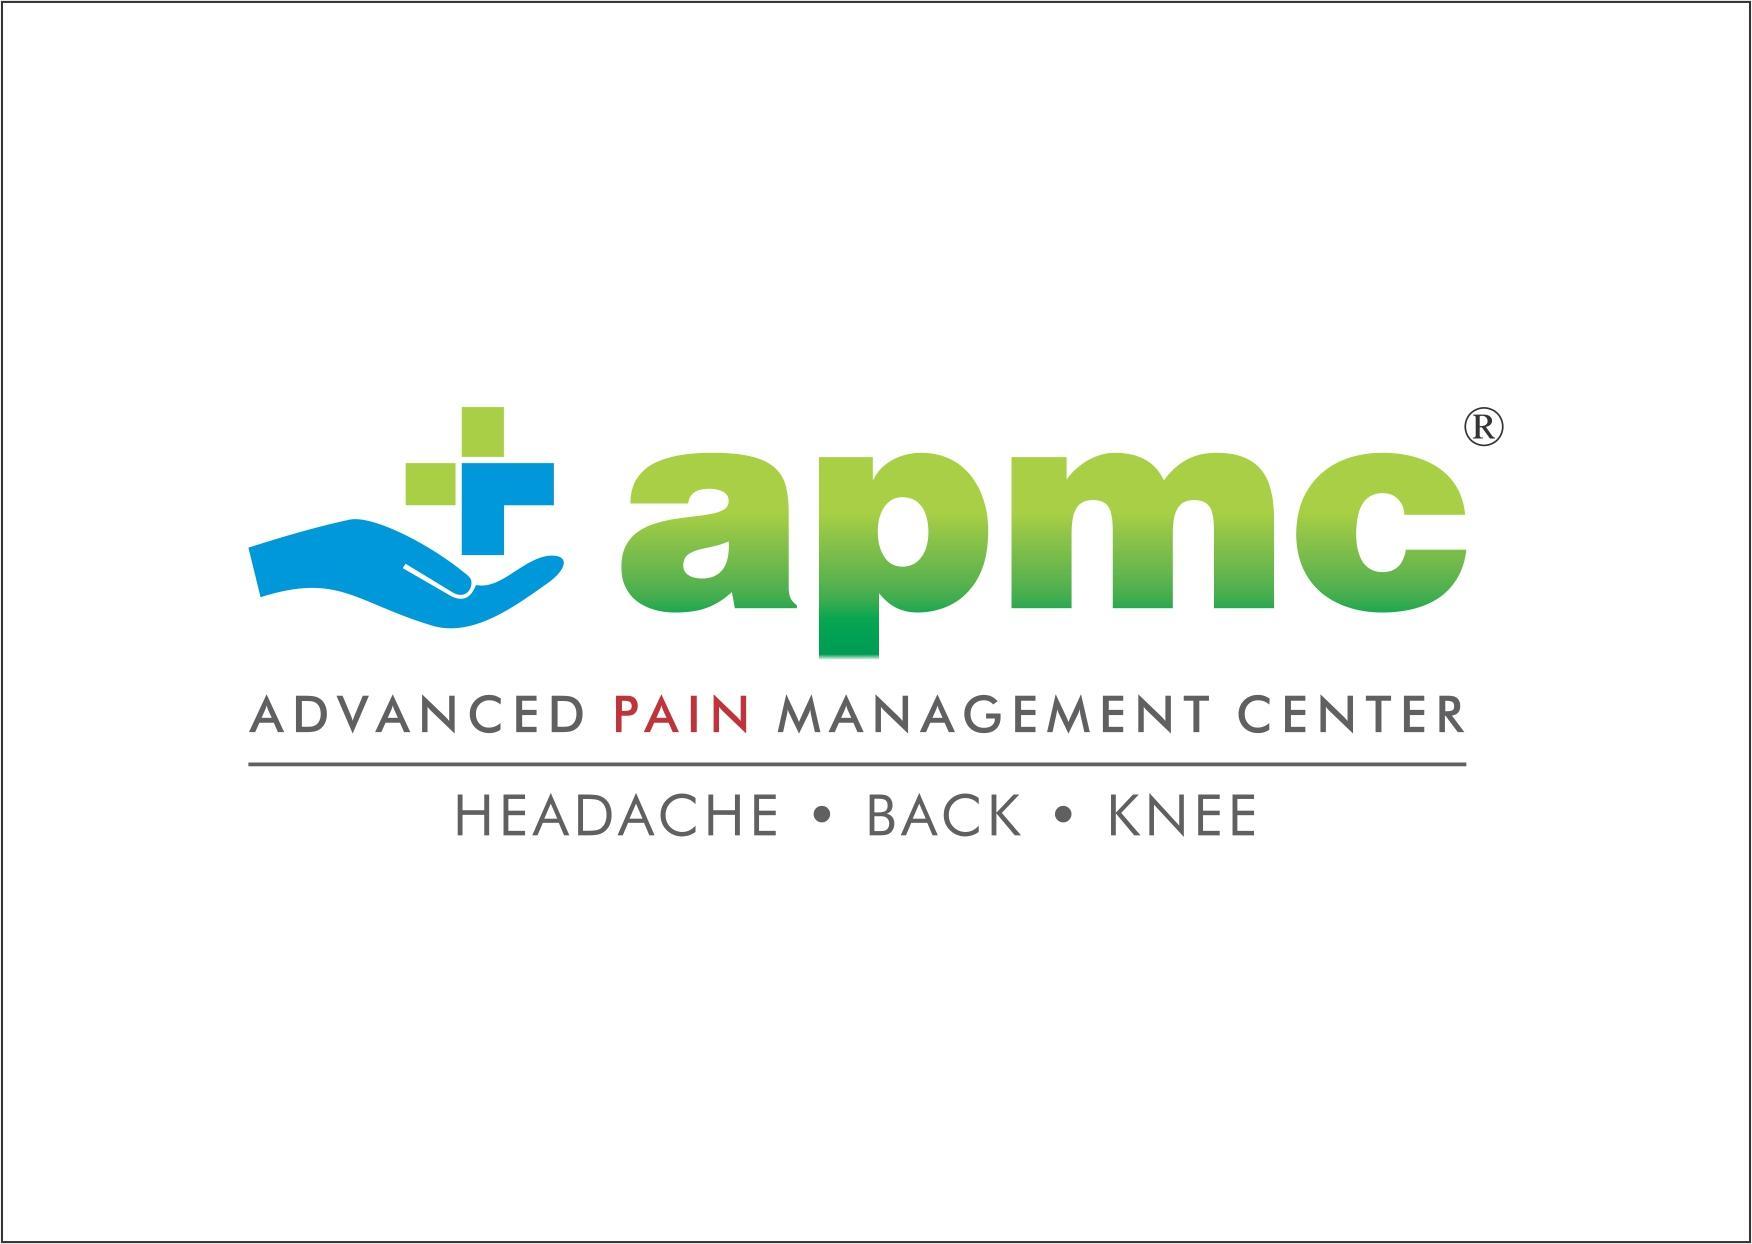 Amrutanjan's Advanced Pain Management Center (APMC)